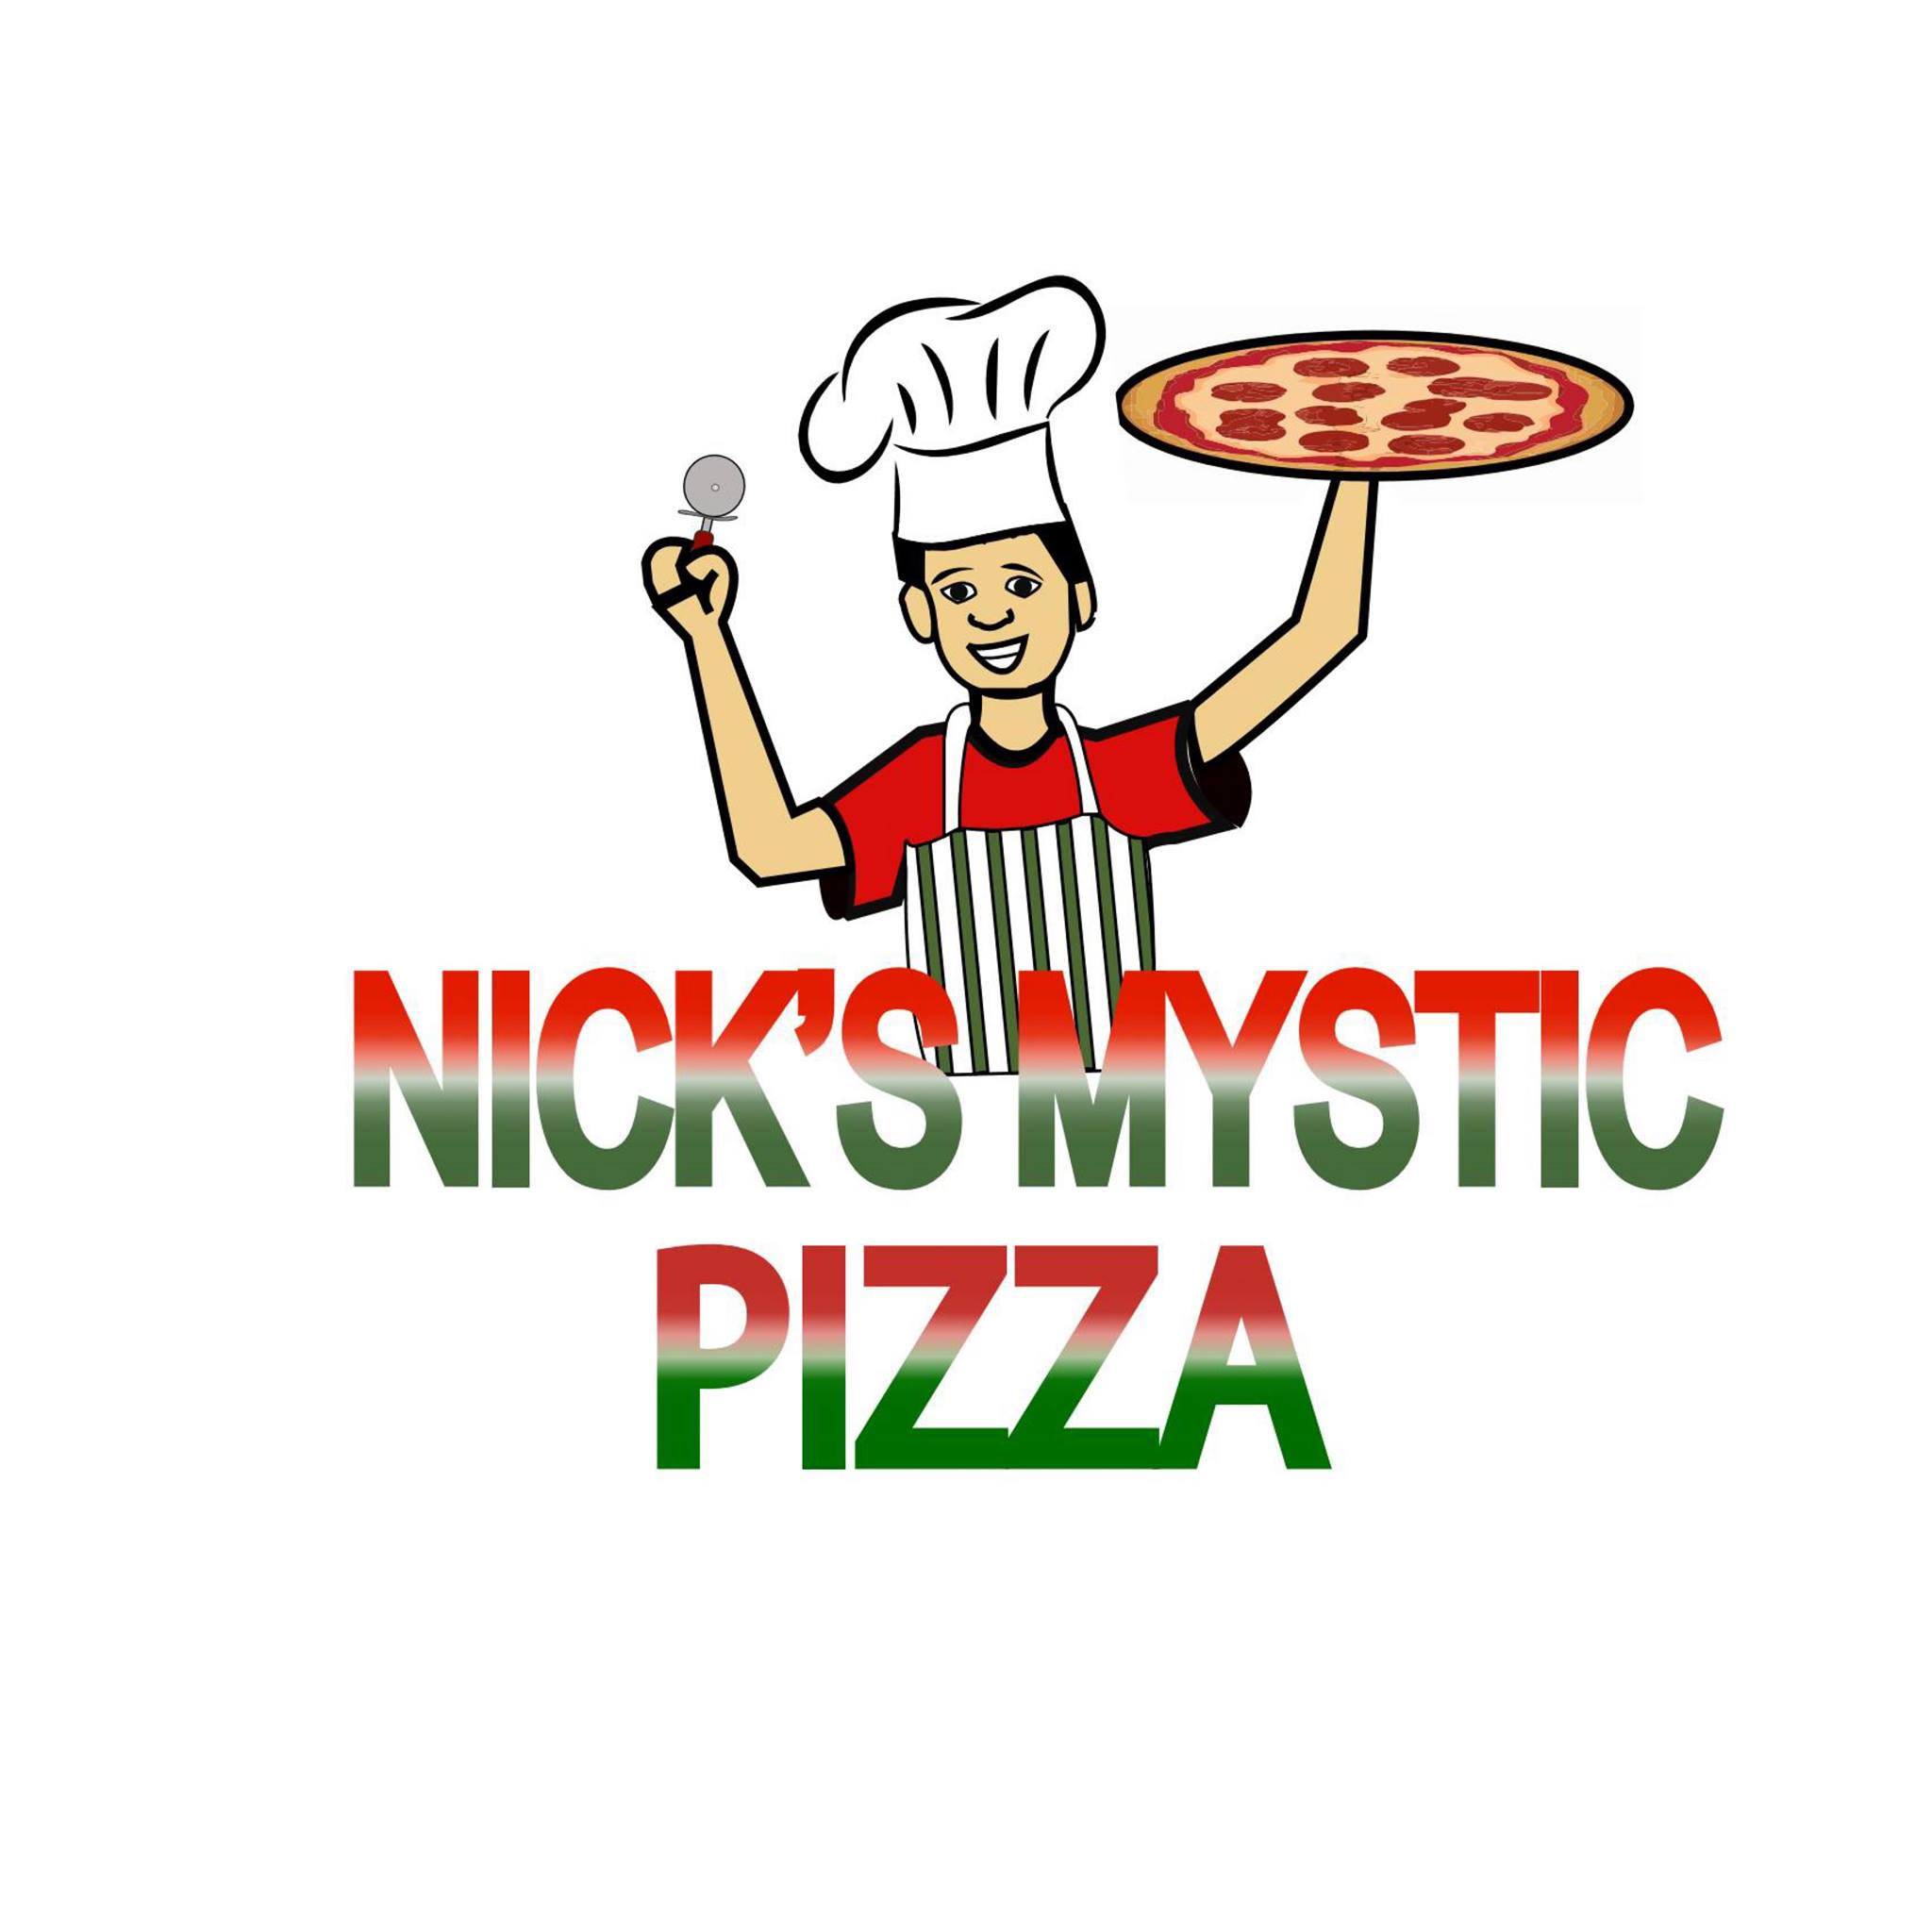 Nick's Mystic Pizza